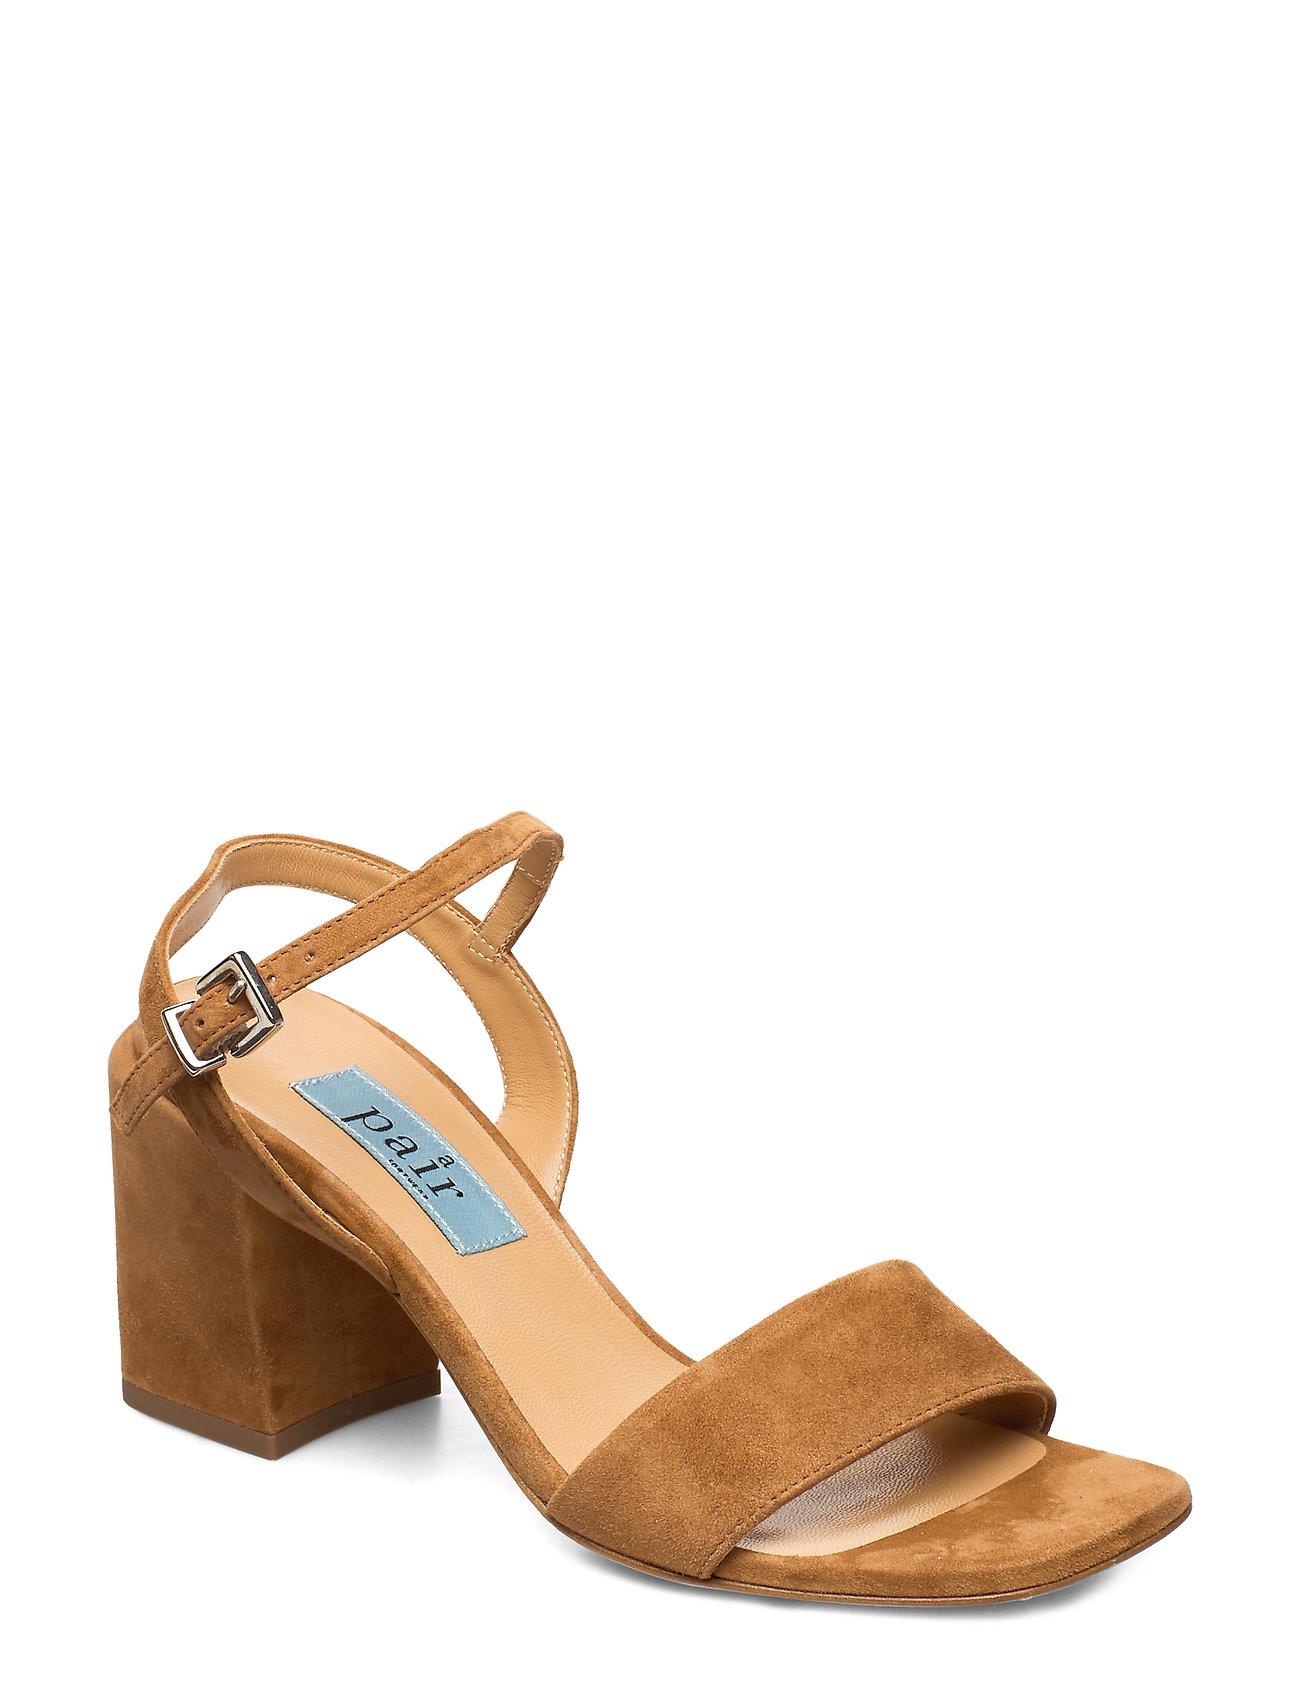 Image of Chunky Classic Square Sandal Sandal Med Hæl Brun Apair (3351890879)